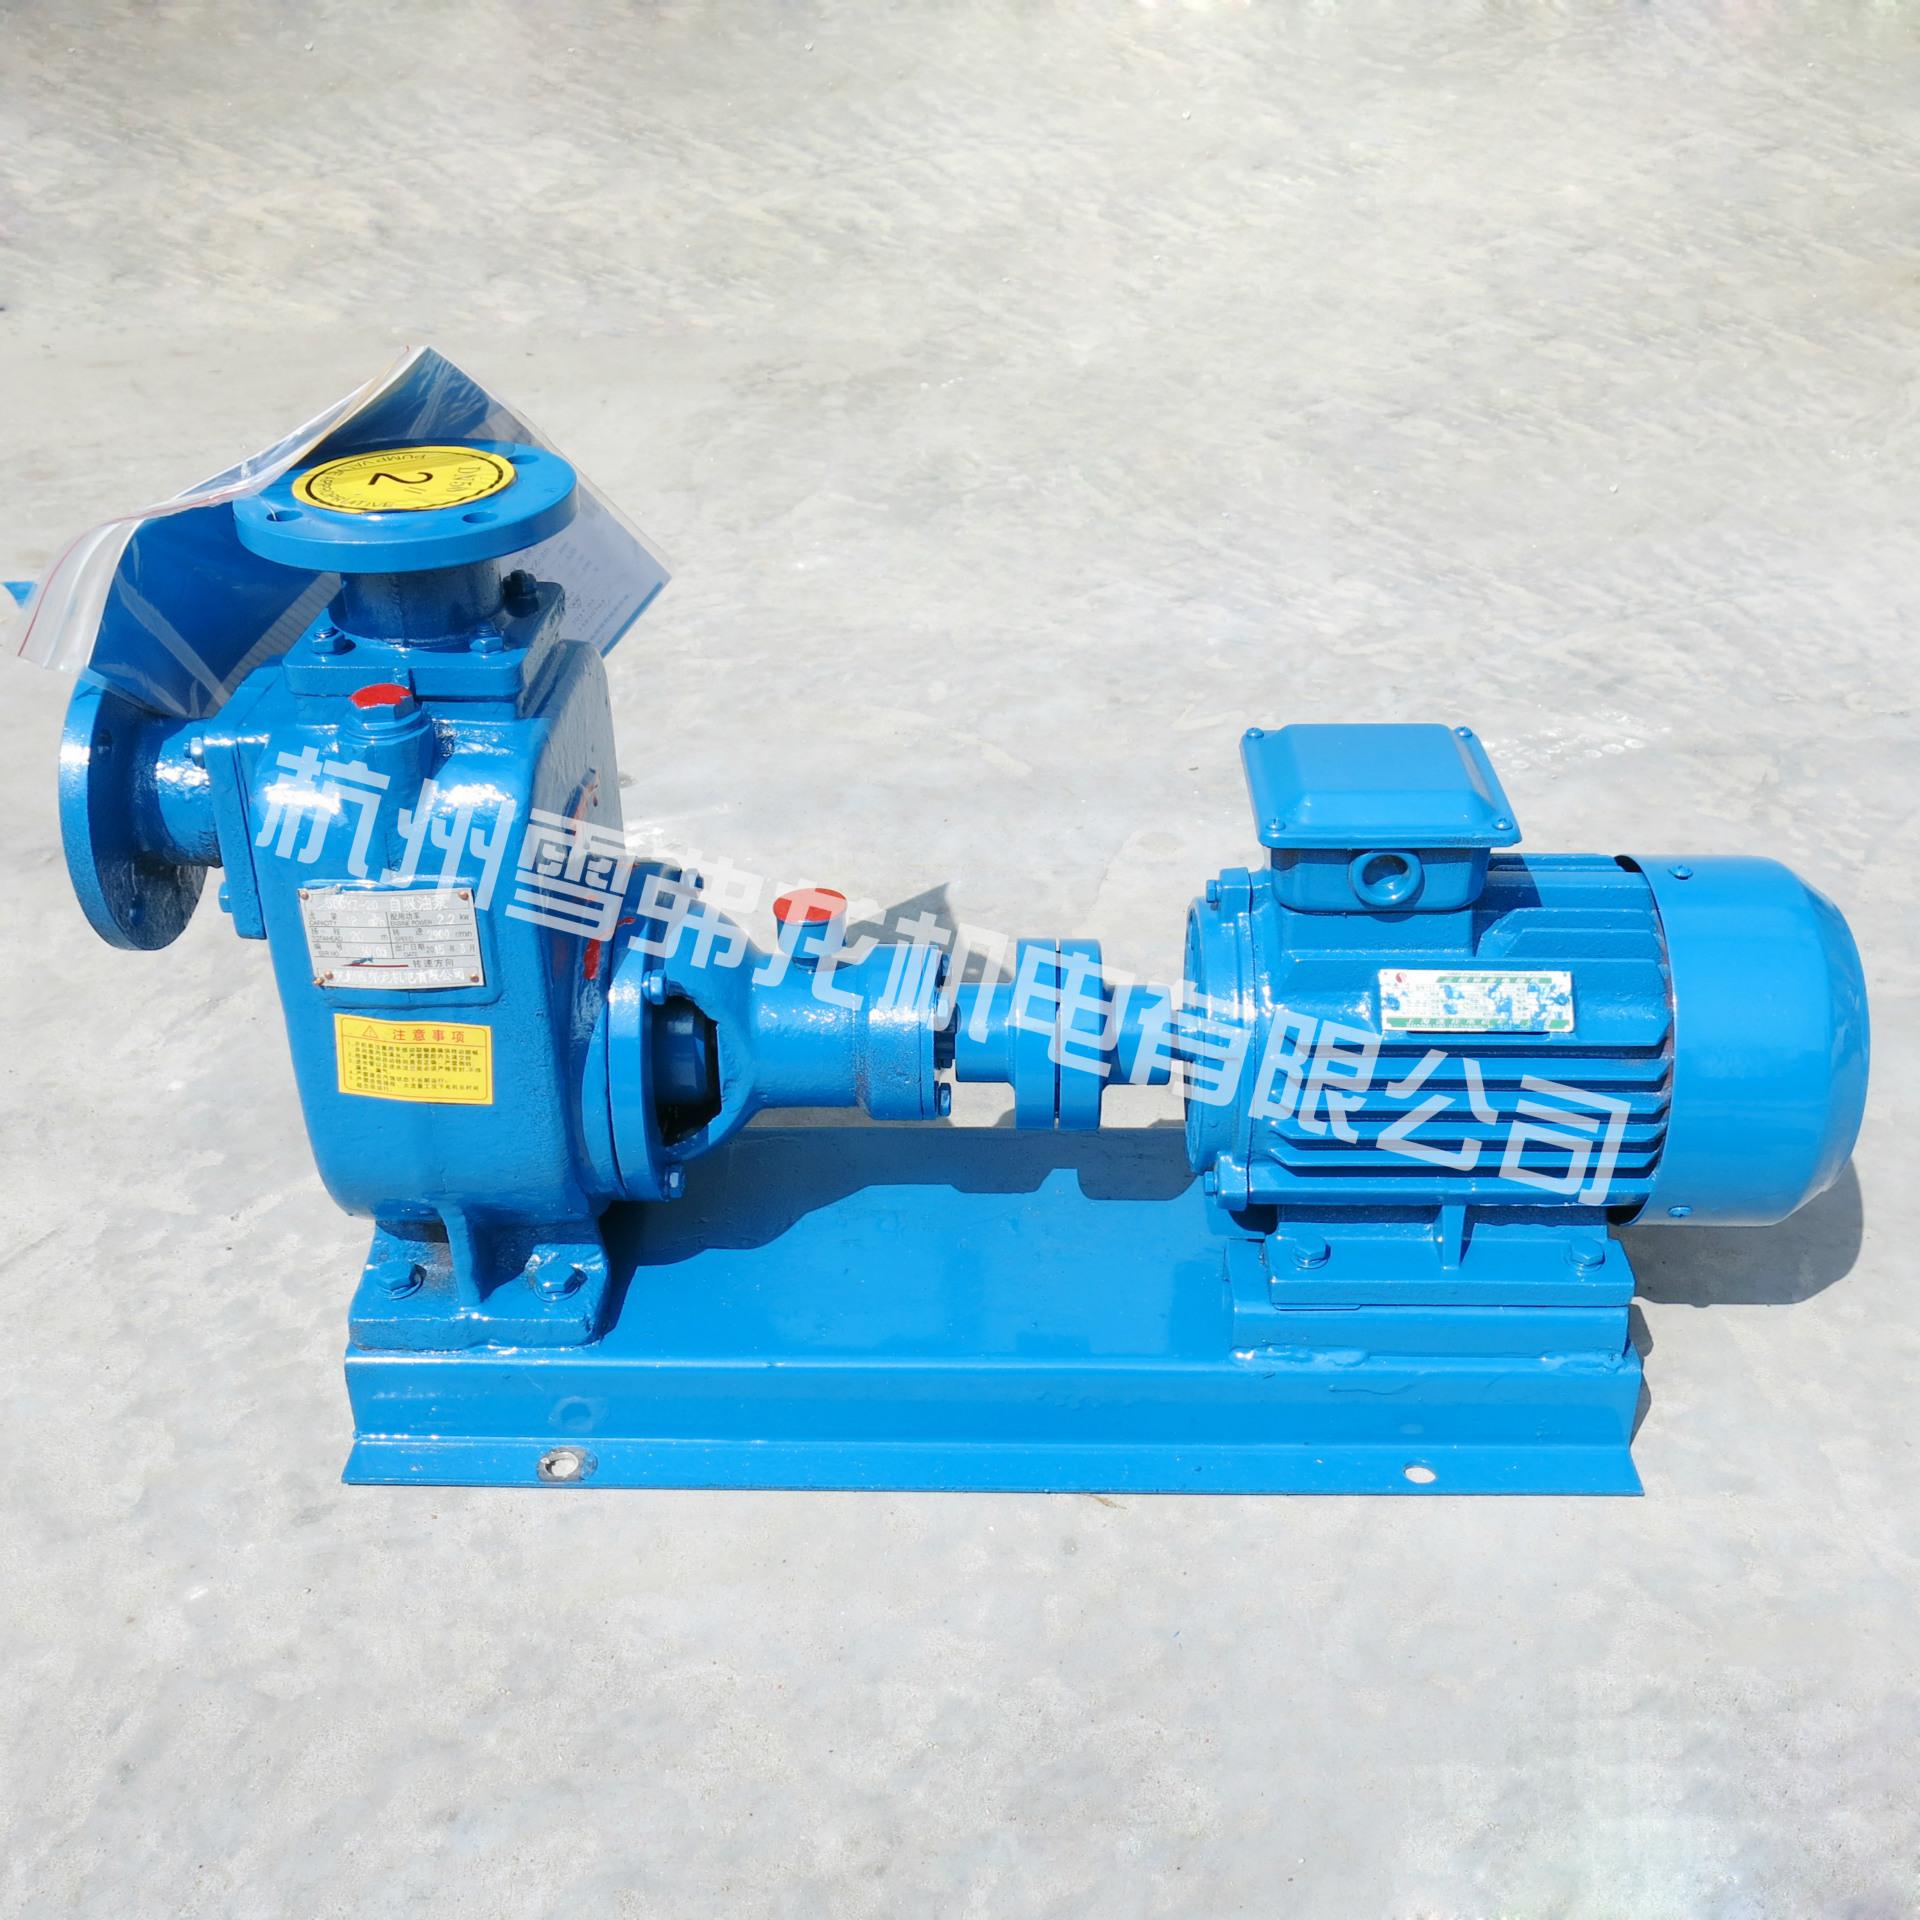 100ZX100-40电动工业流程泵自吸式抽清水泵/ZX卧式清水自吸泵